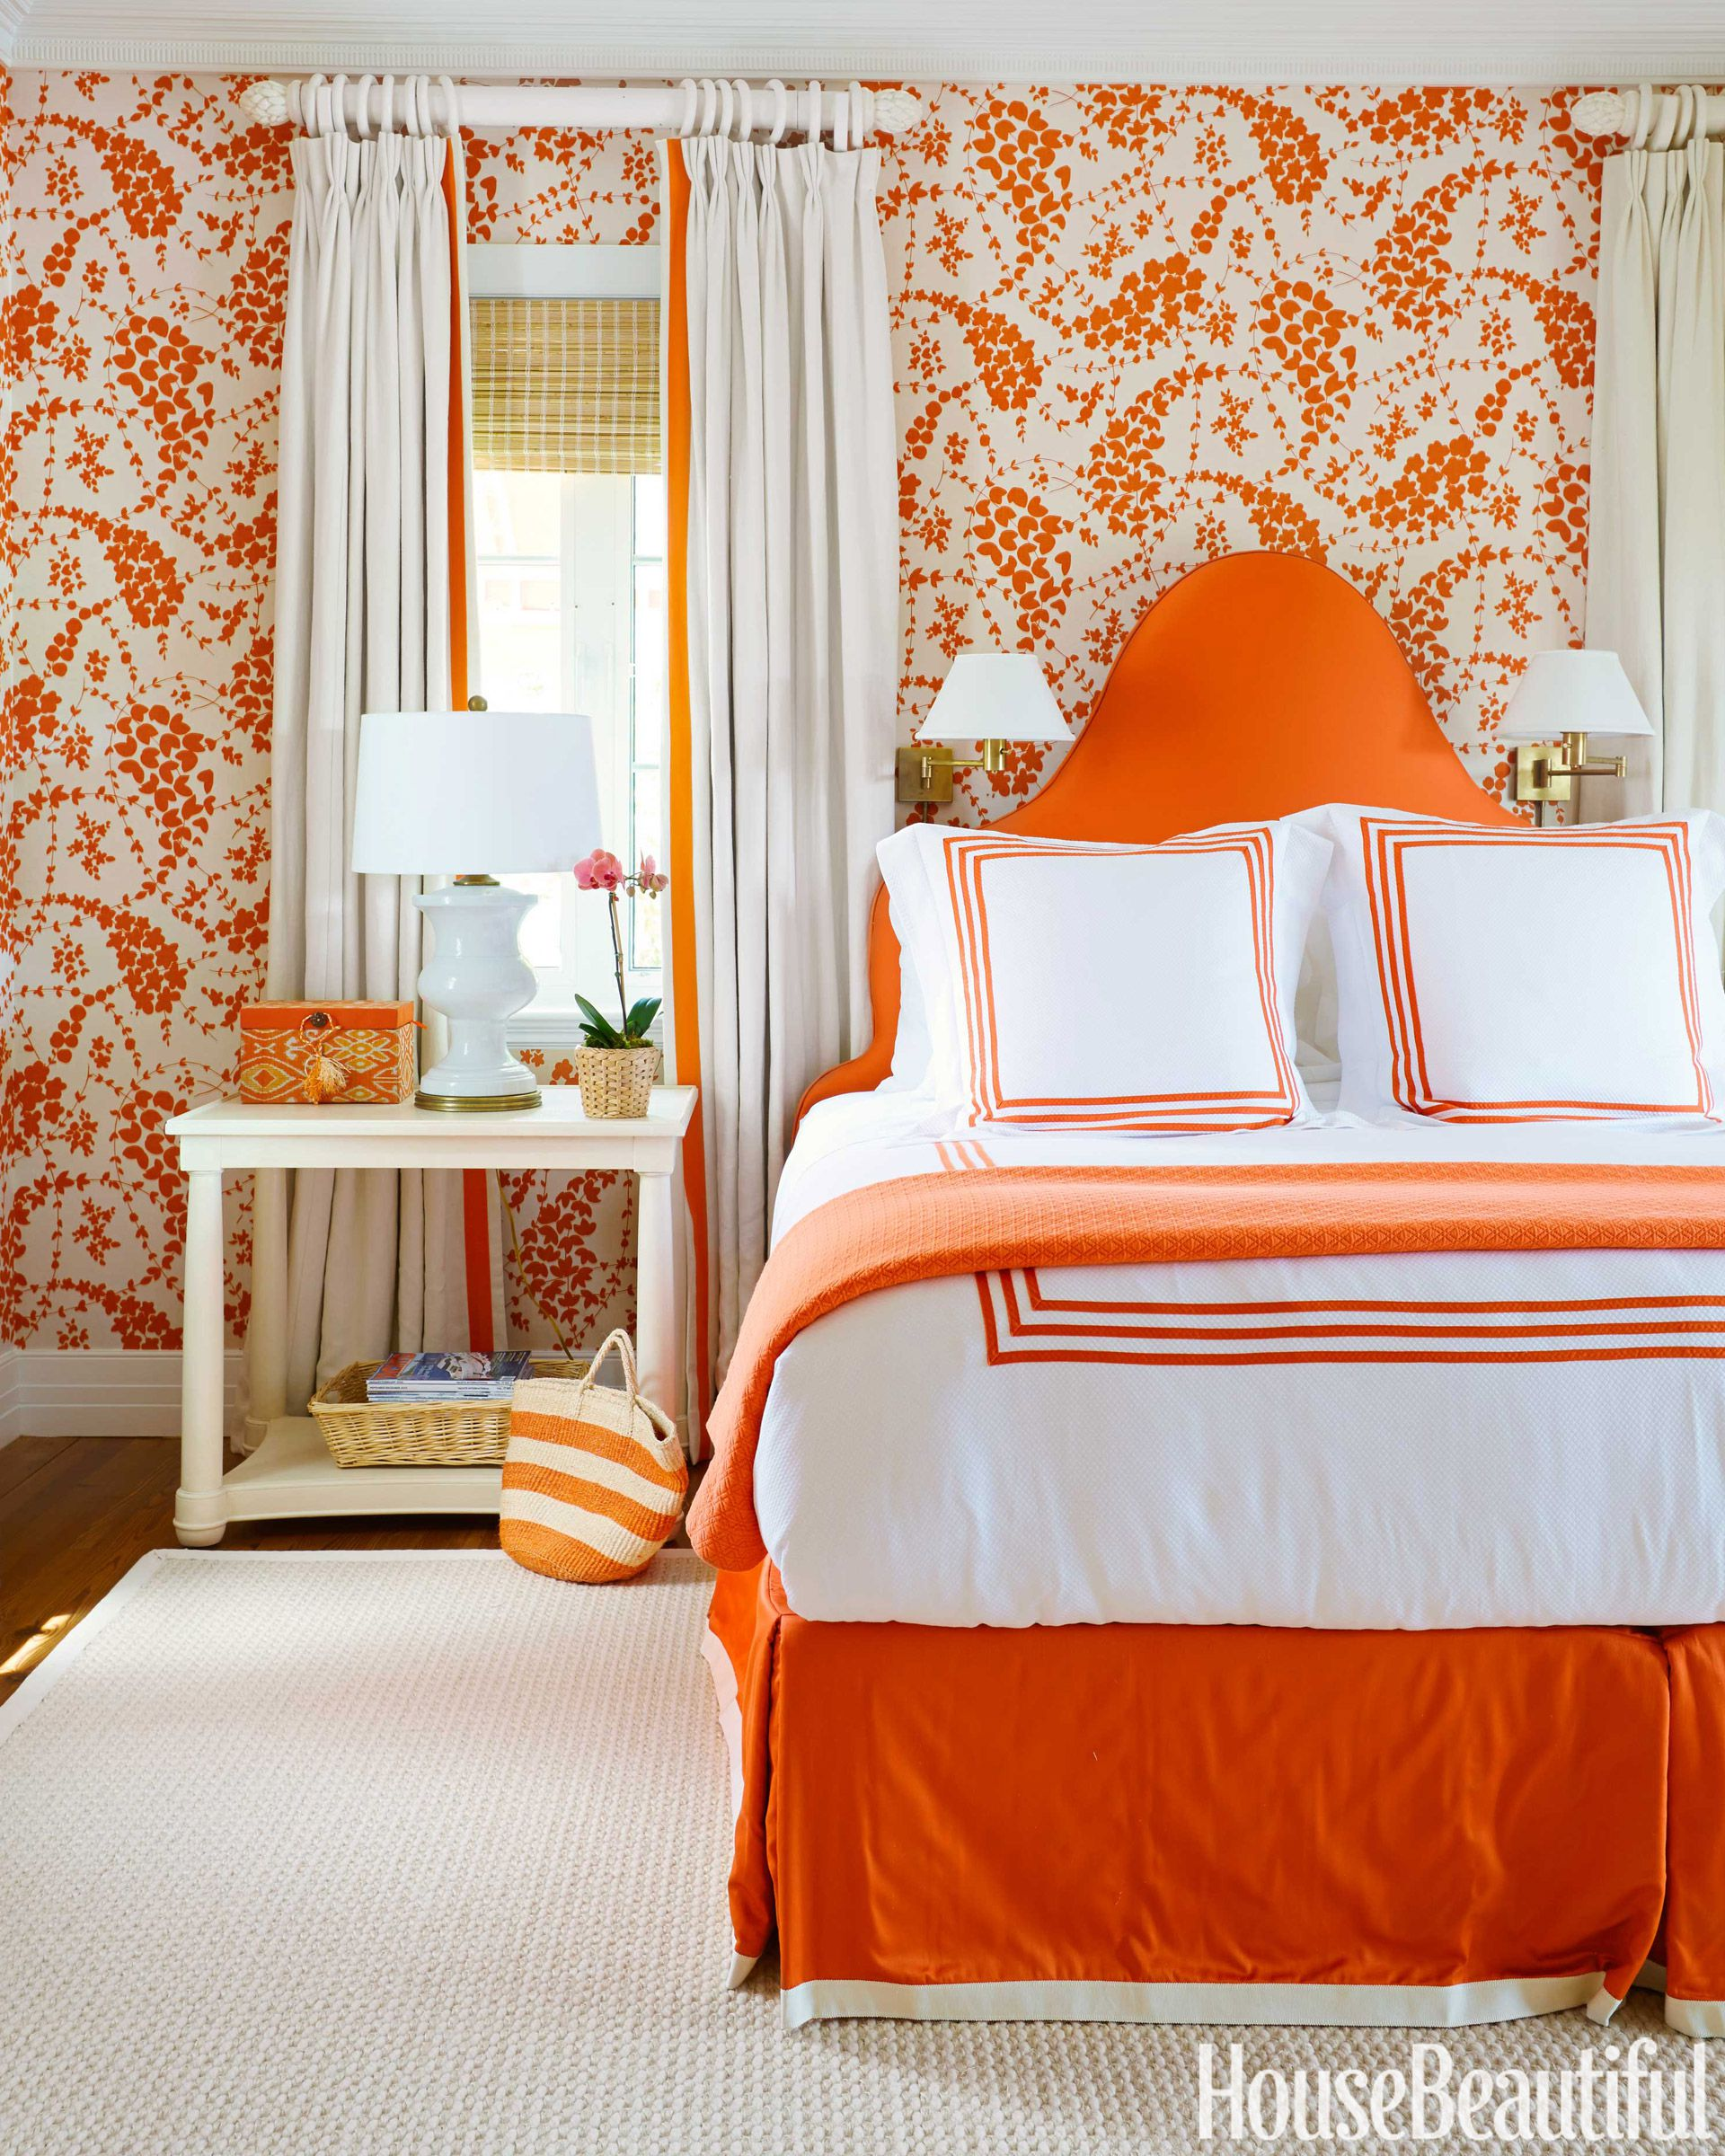 Bedroom Colour Hd Bedroom Furniture Design Bedroom Chairs For Small Spaces Bedrooms For Girls 2015: Significado Das Cores Na Decoração: Qual Cor Usar Em Cada